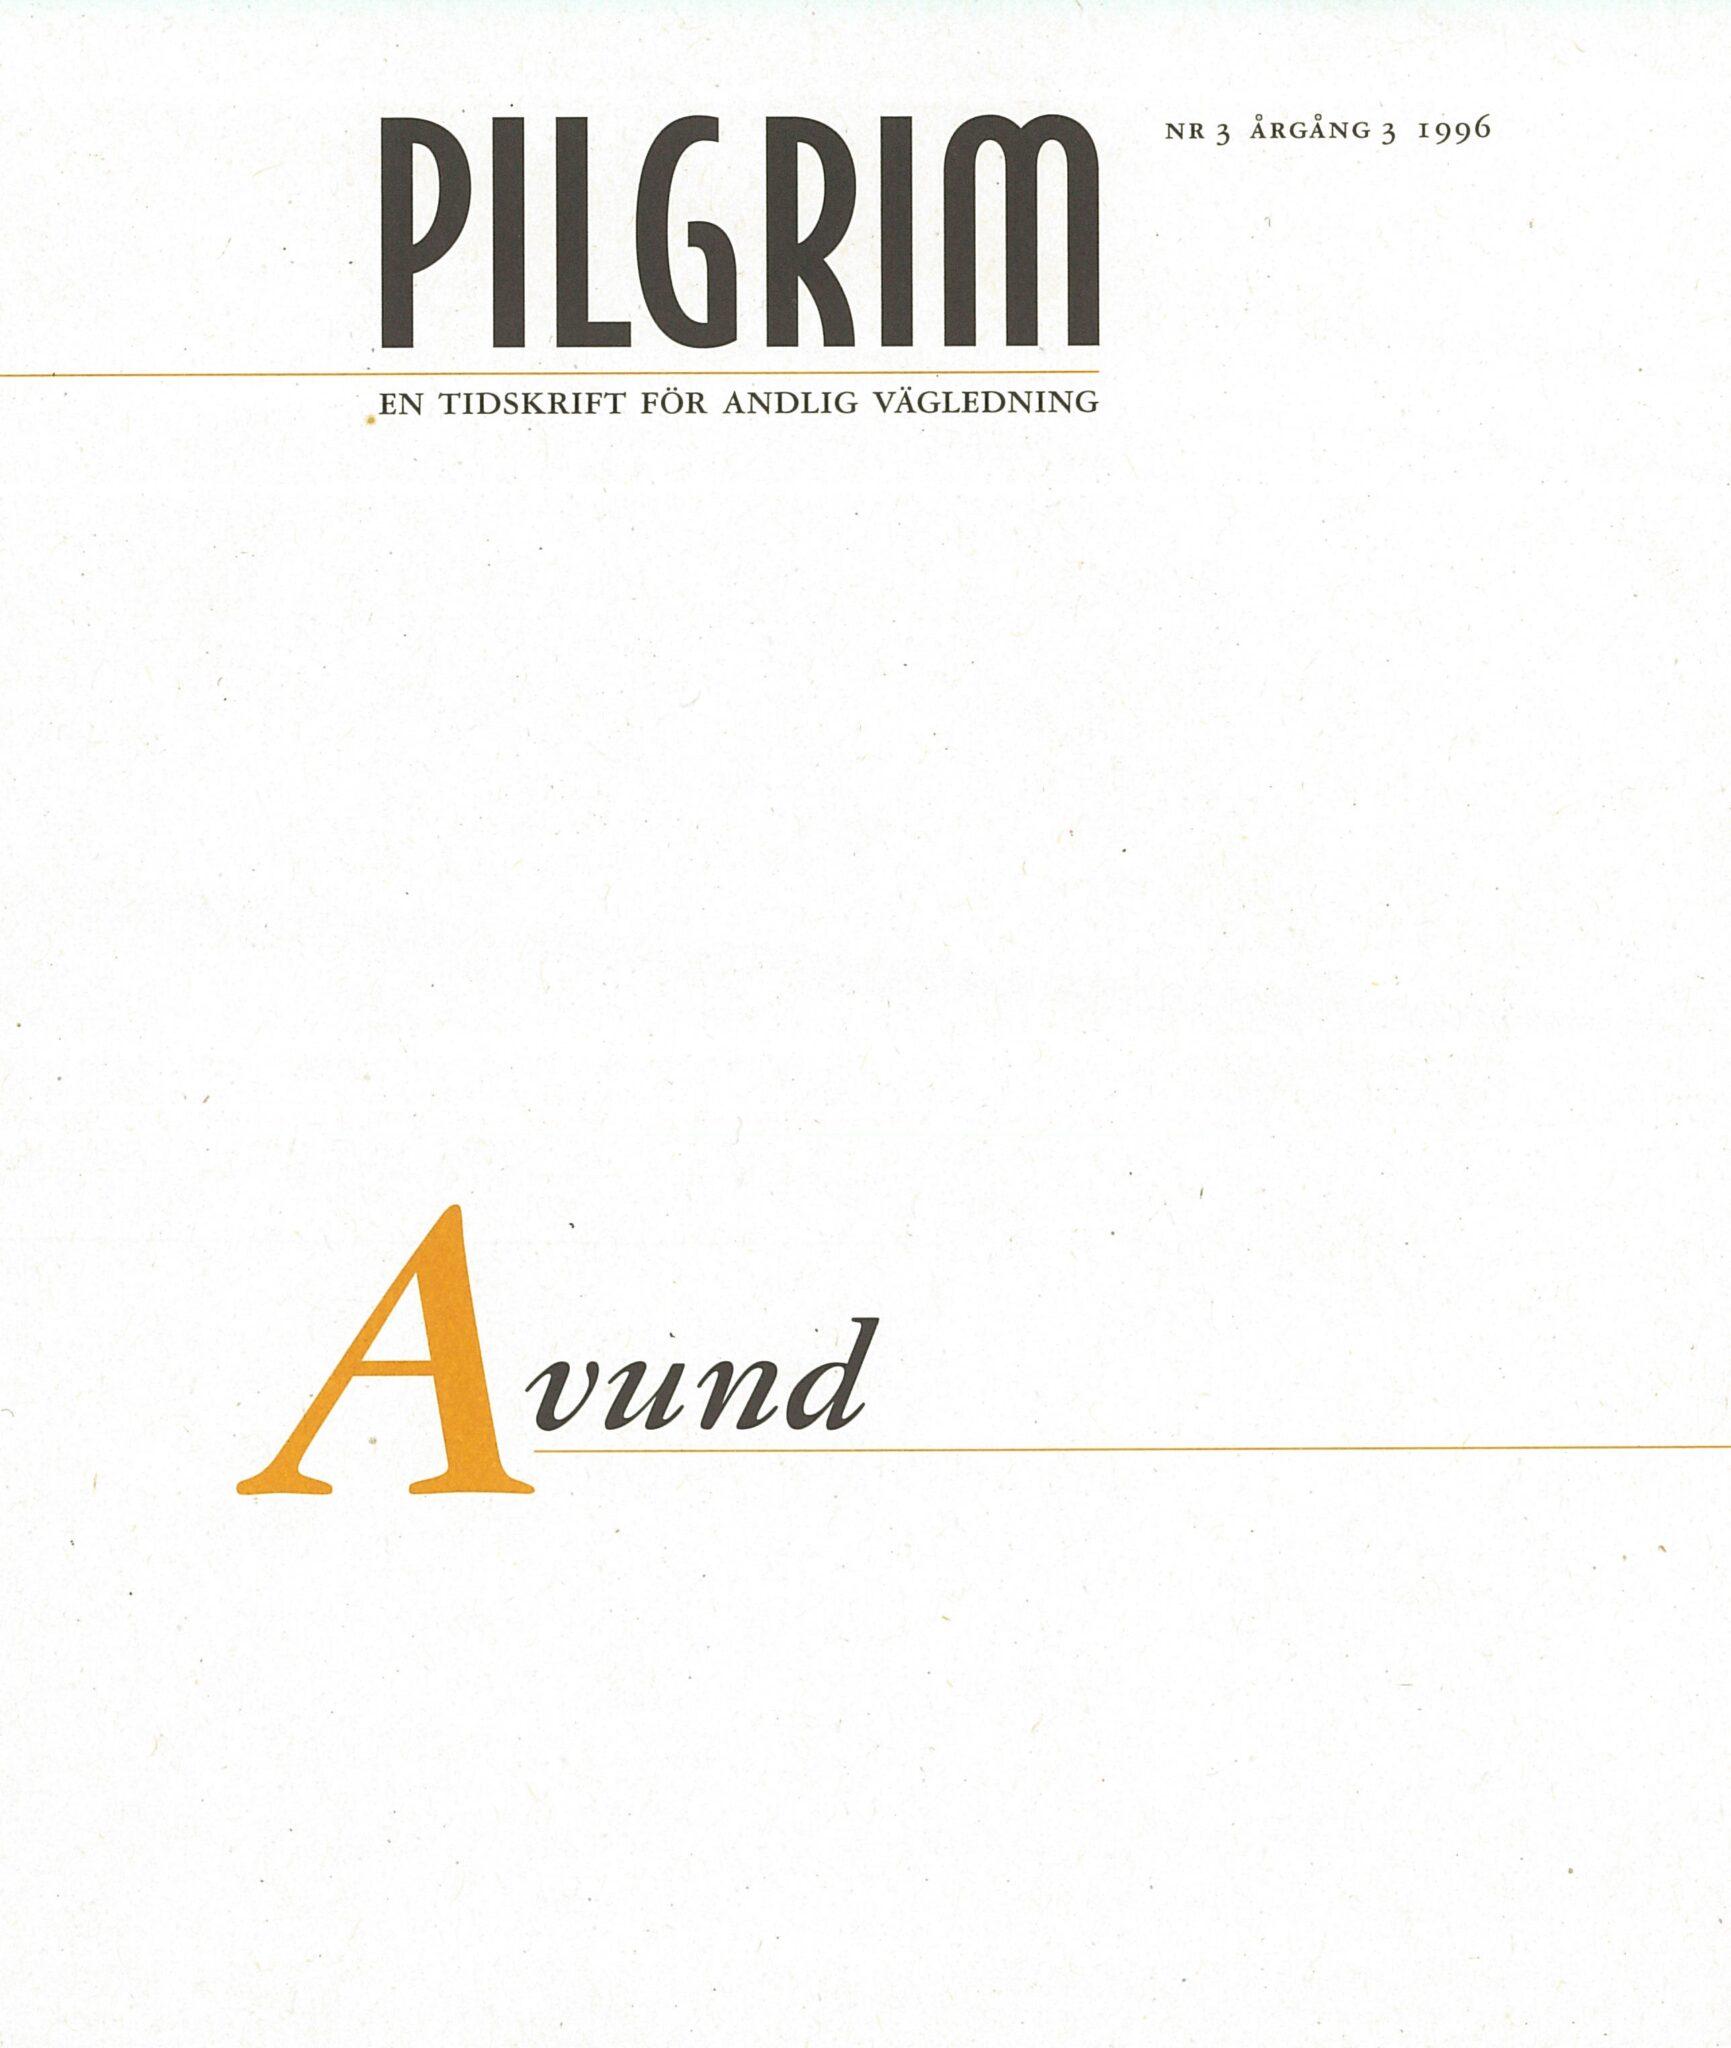 Pilgrim frams 1996-3